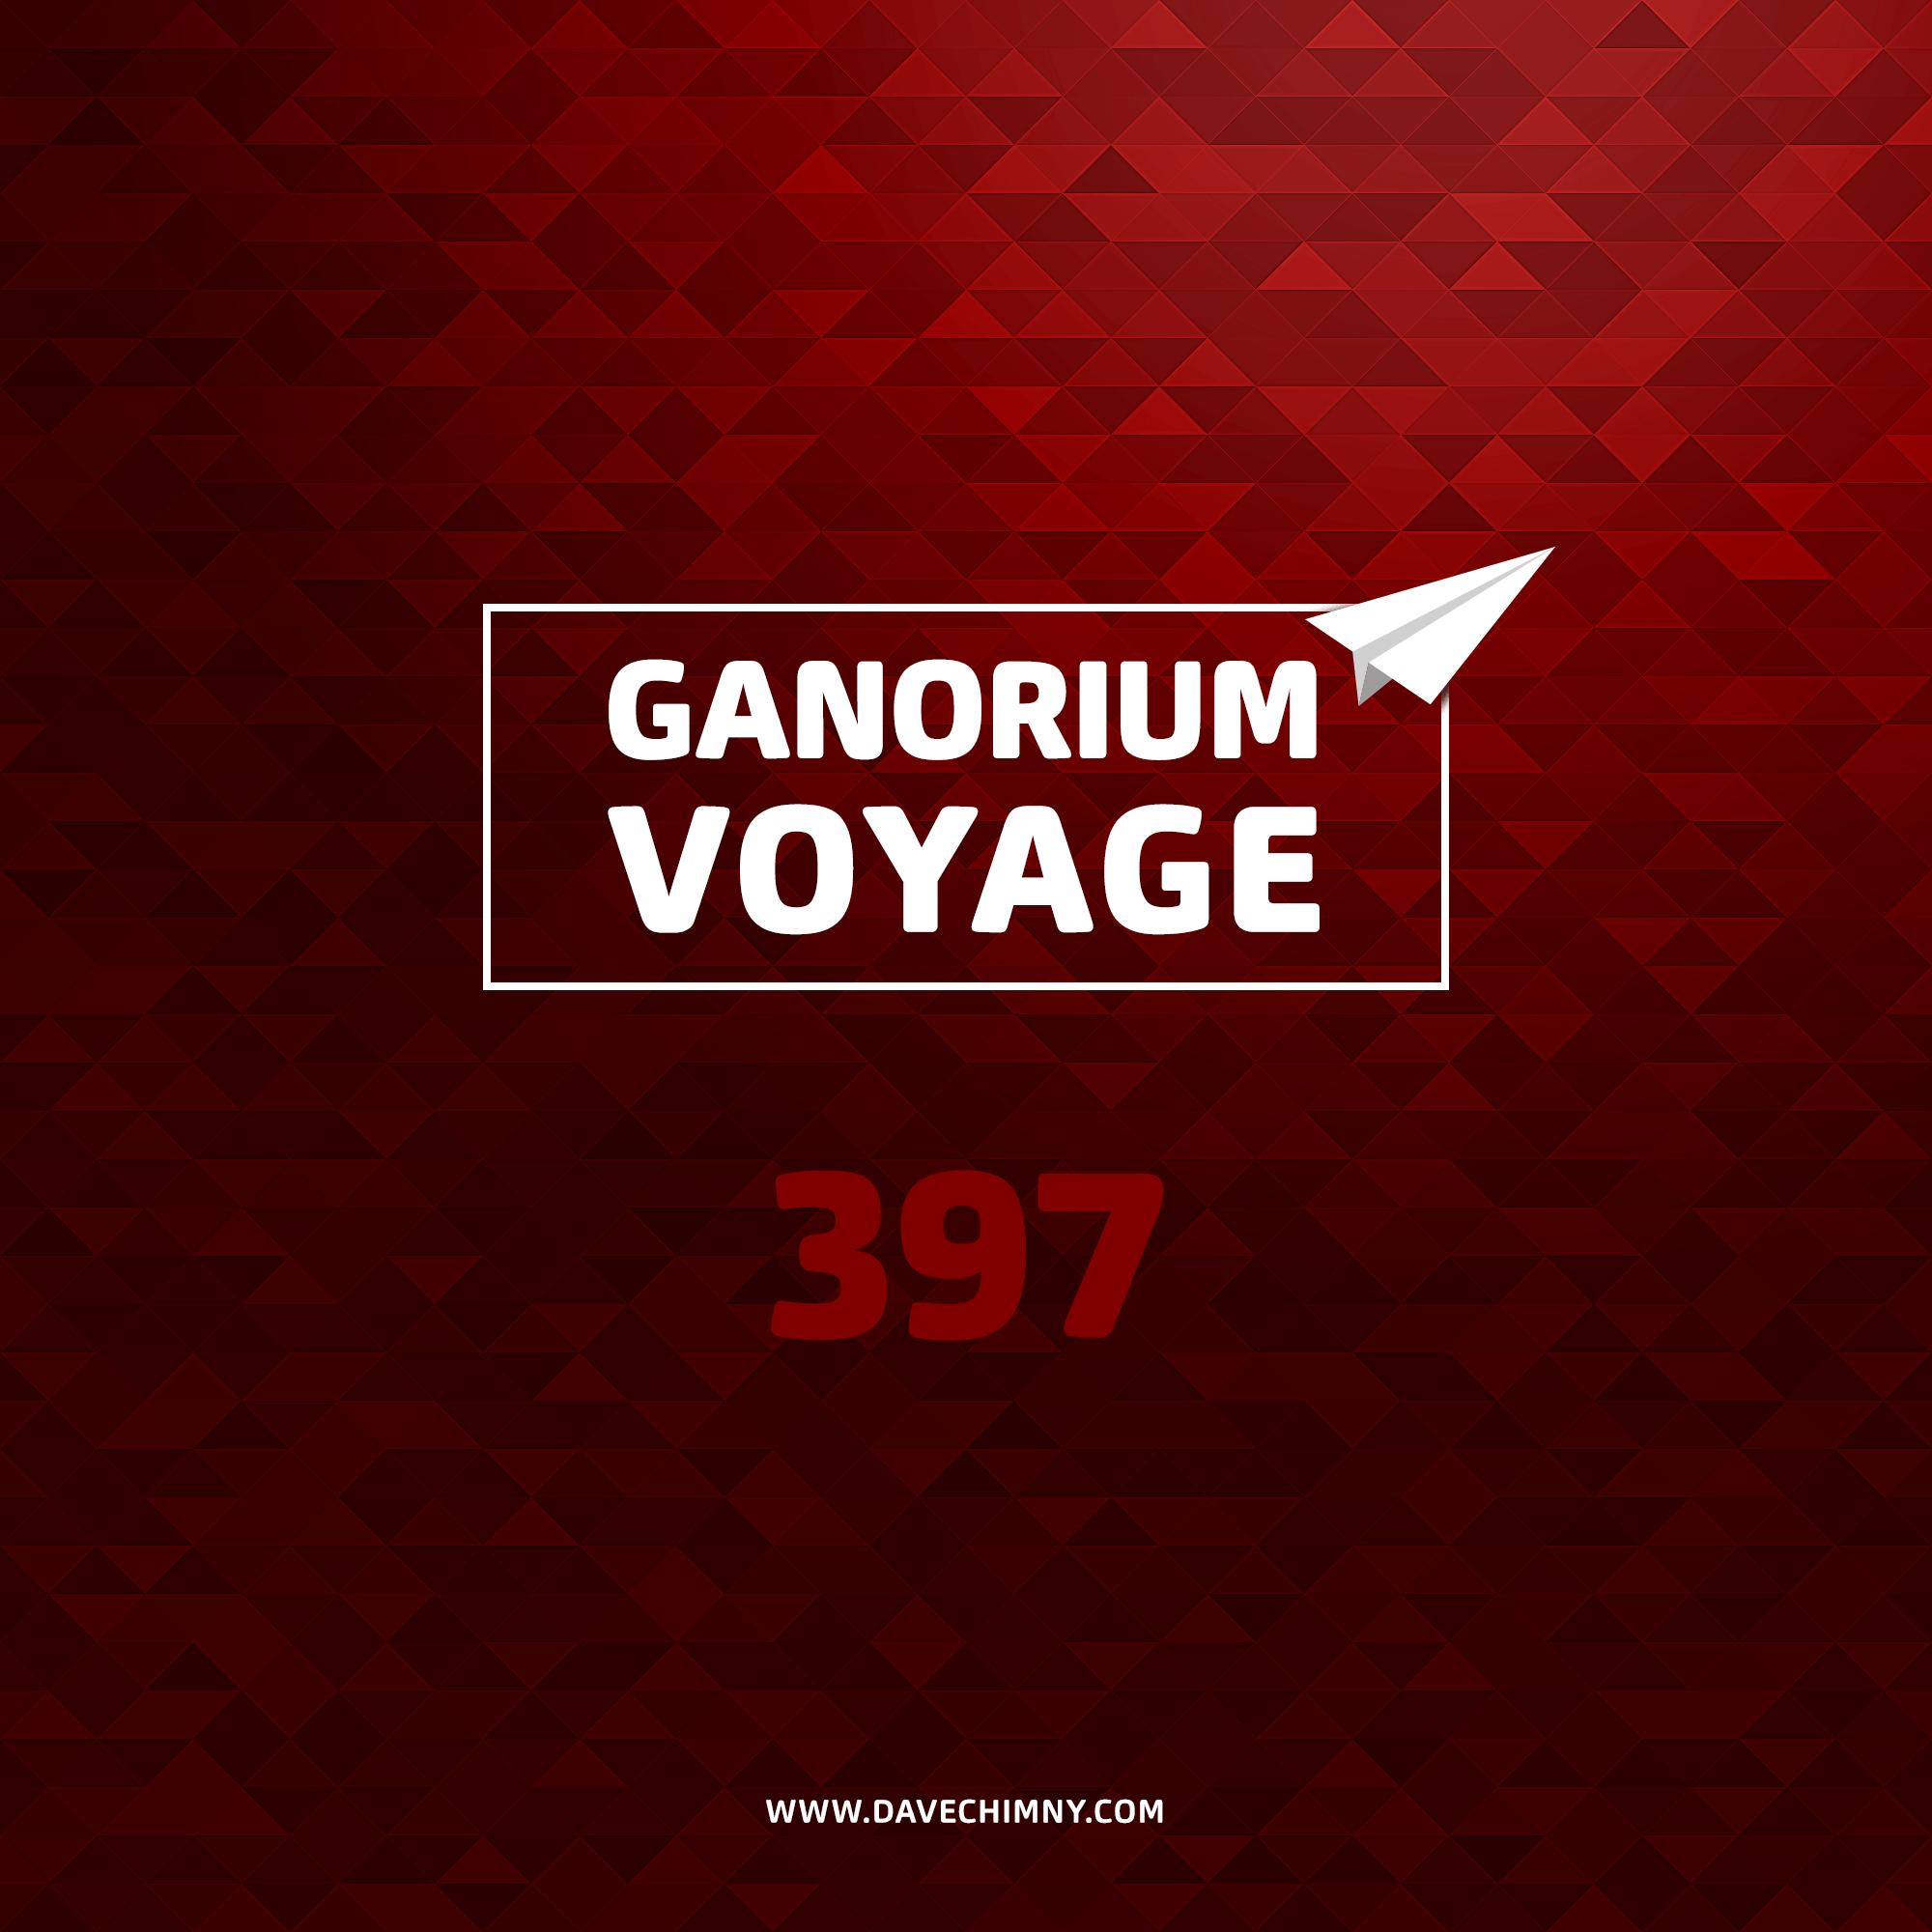 Dave Chimny - Ganorium Voyage 397